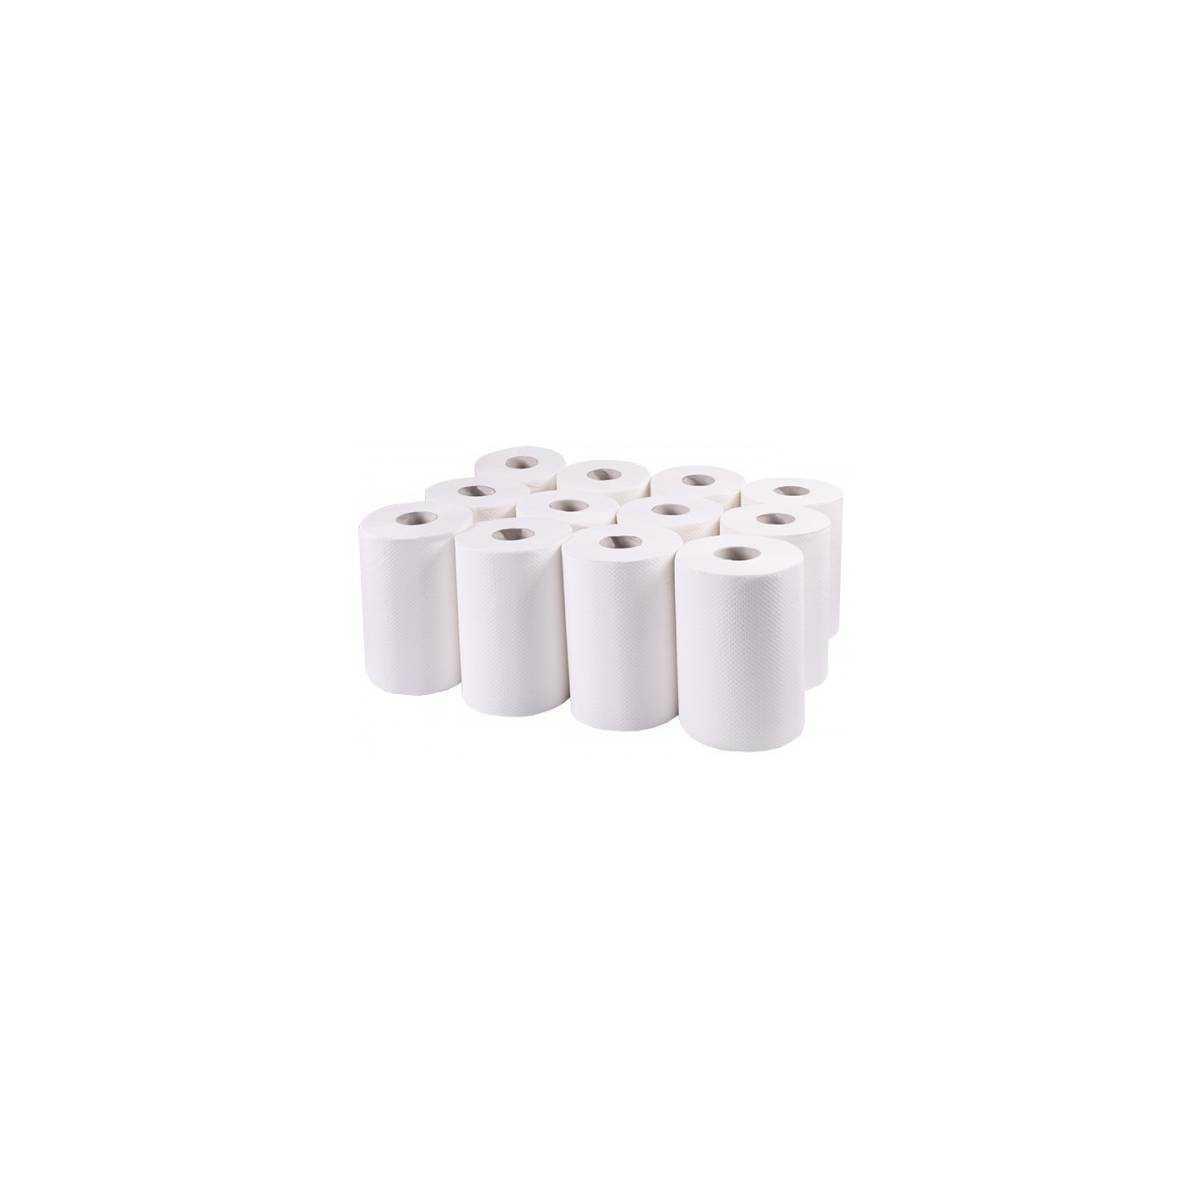 Полотенца в рулоне MINI (143000) 143000 Tischa Papier